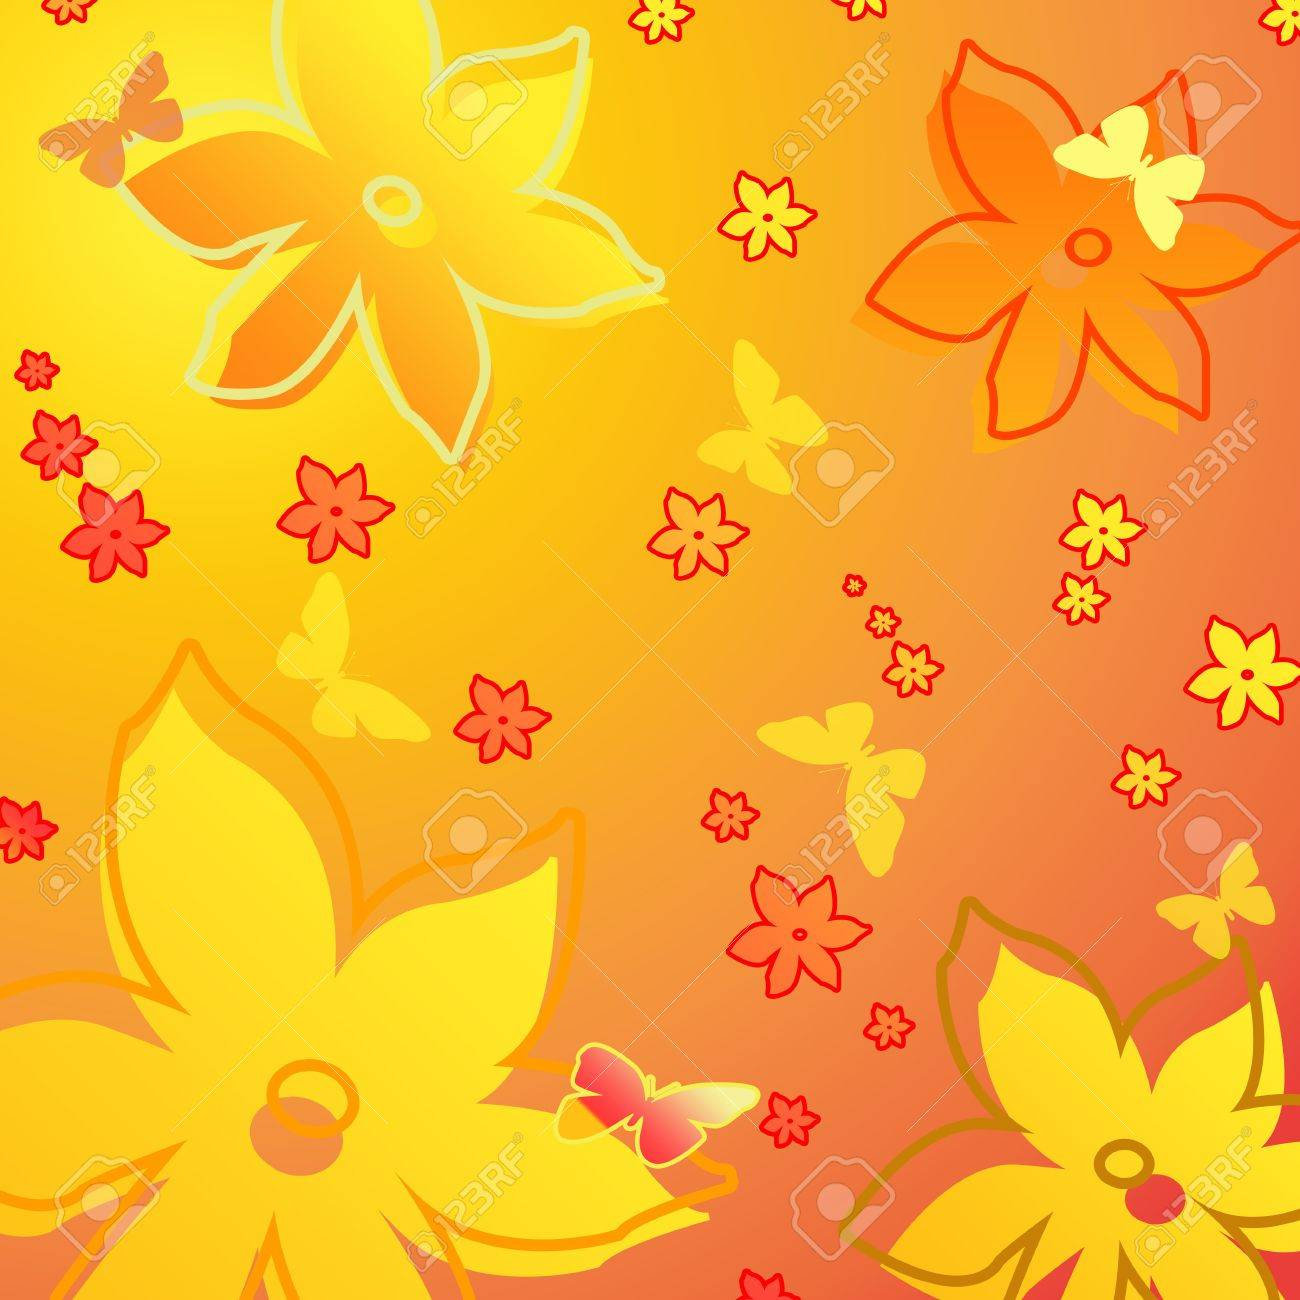 Background (flowers) Stock Photo - 2327588